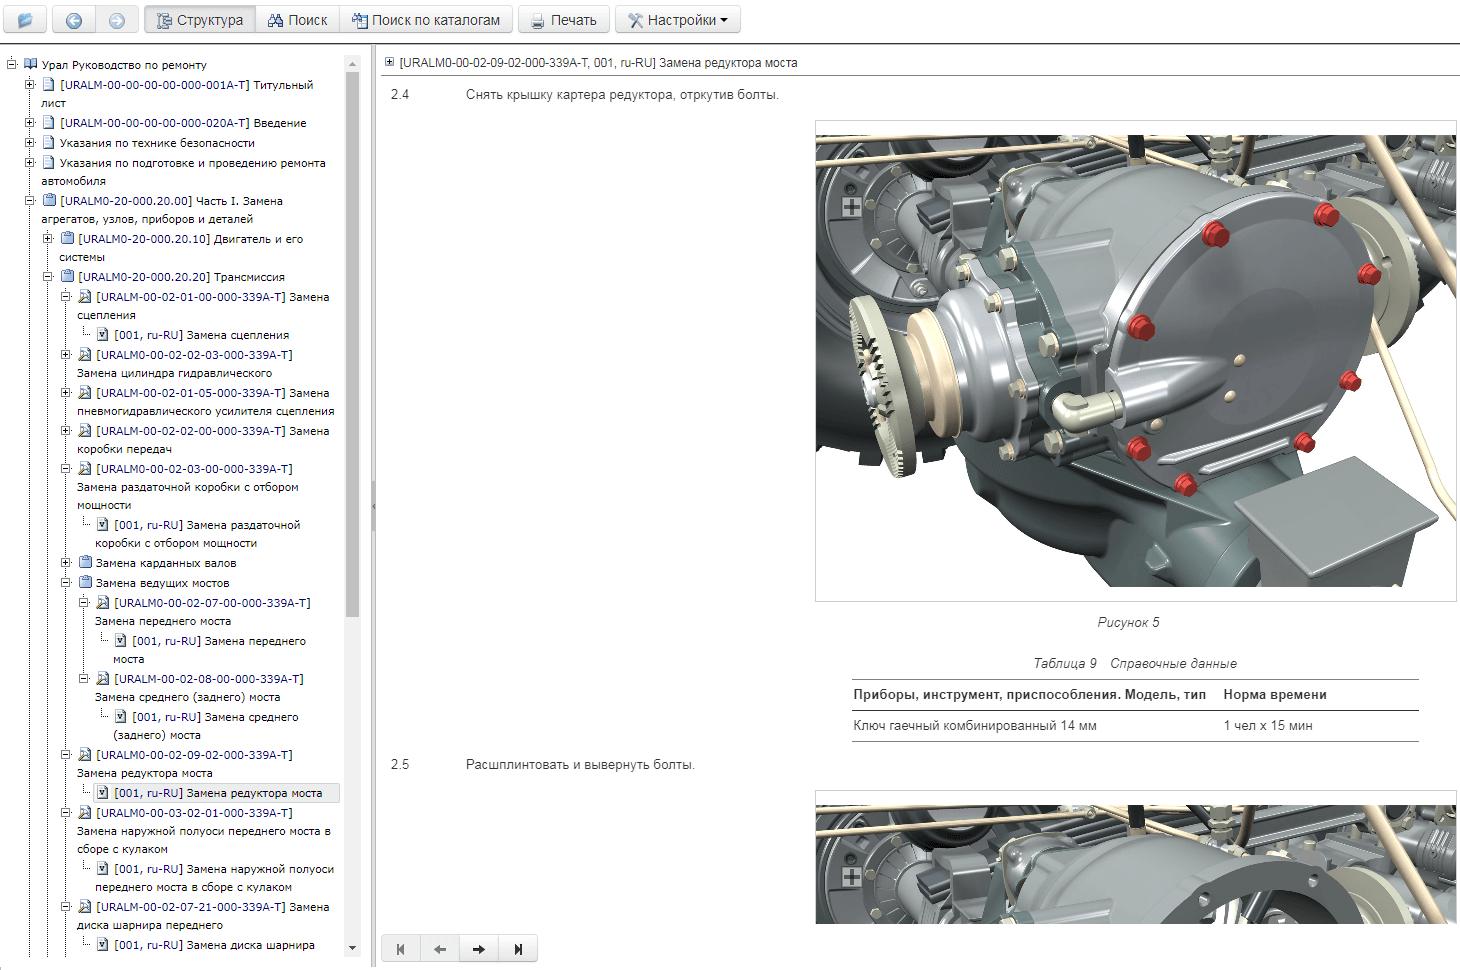 Technical Guide Web Server